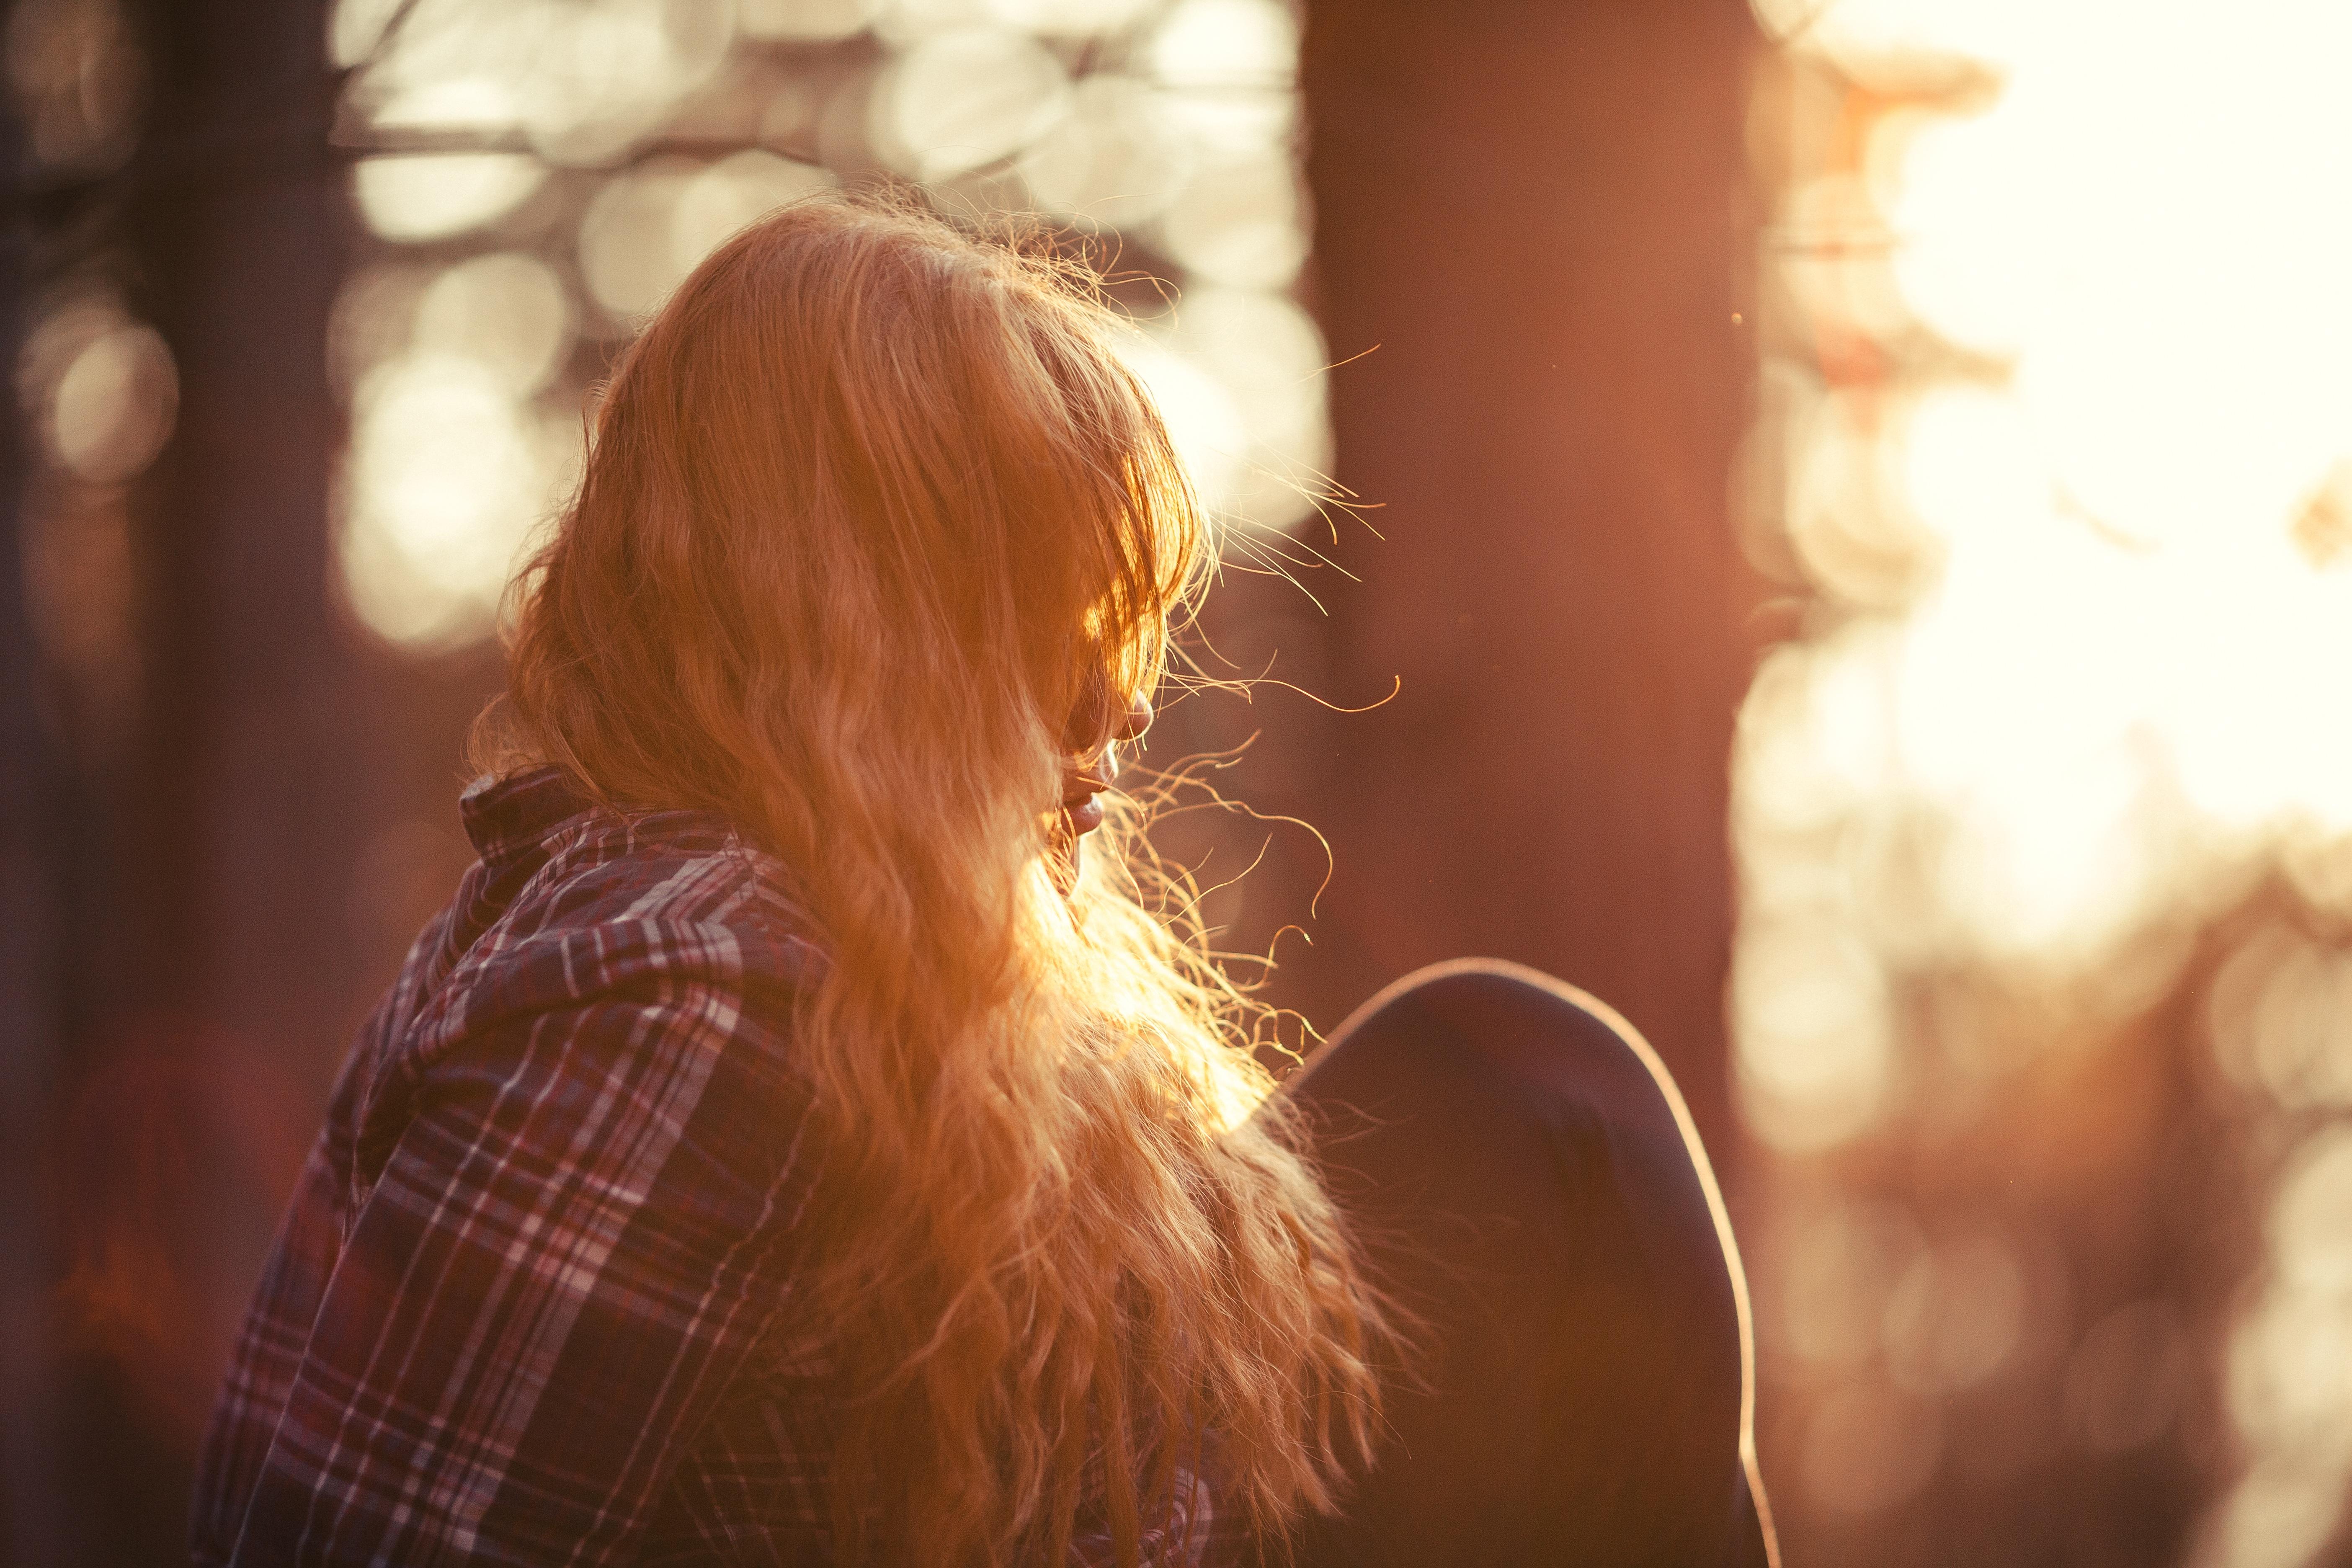 dating palvelut auringon paiste rannikolla dating Debrecen